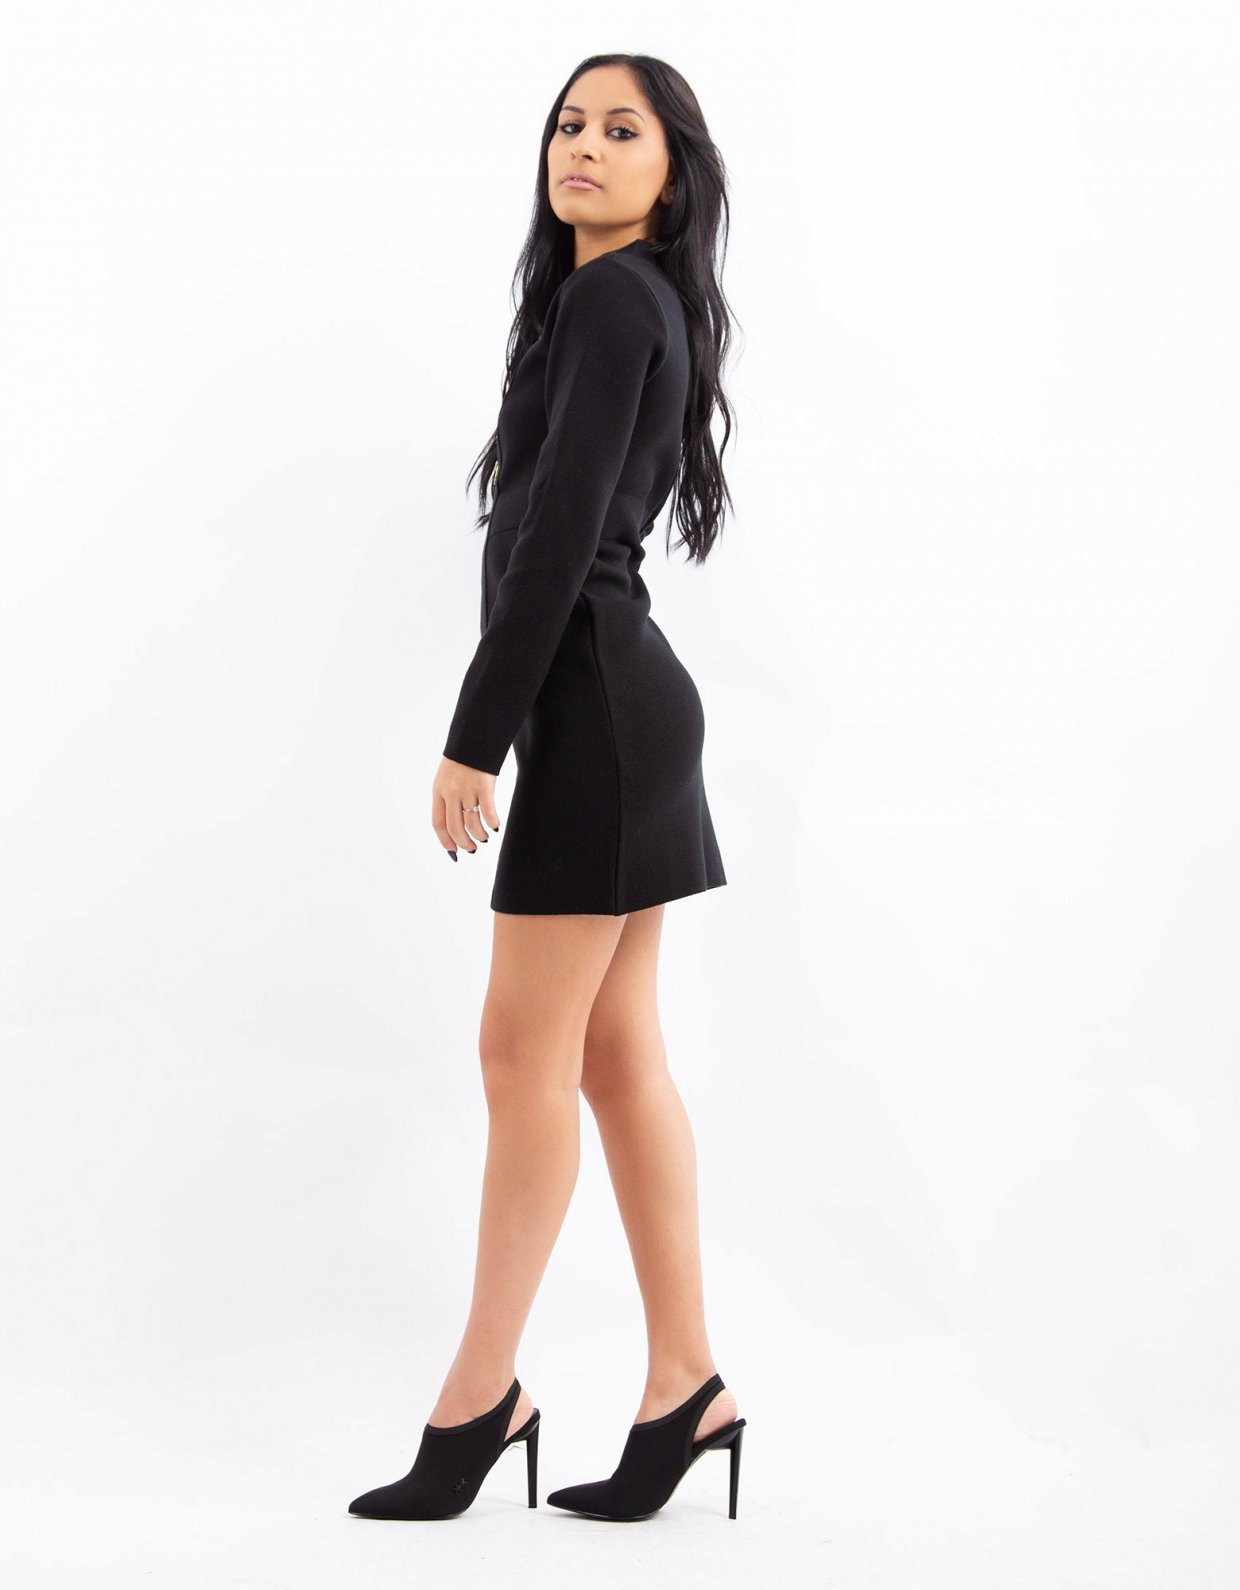 Combos Knitwear Combos W22 – Black zippered dress